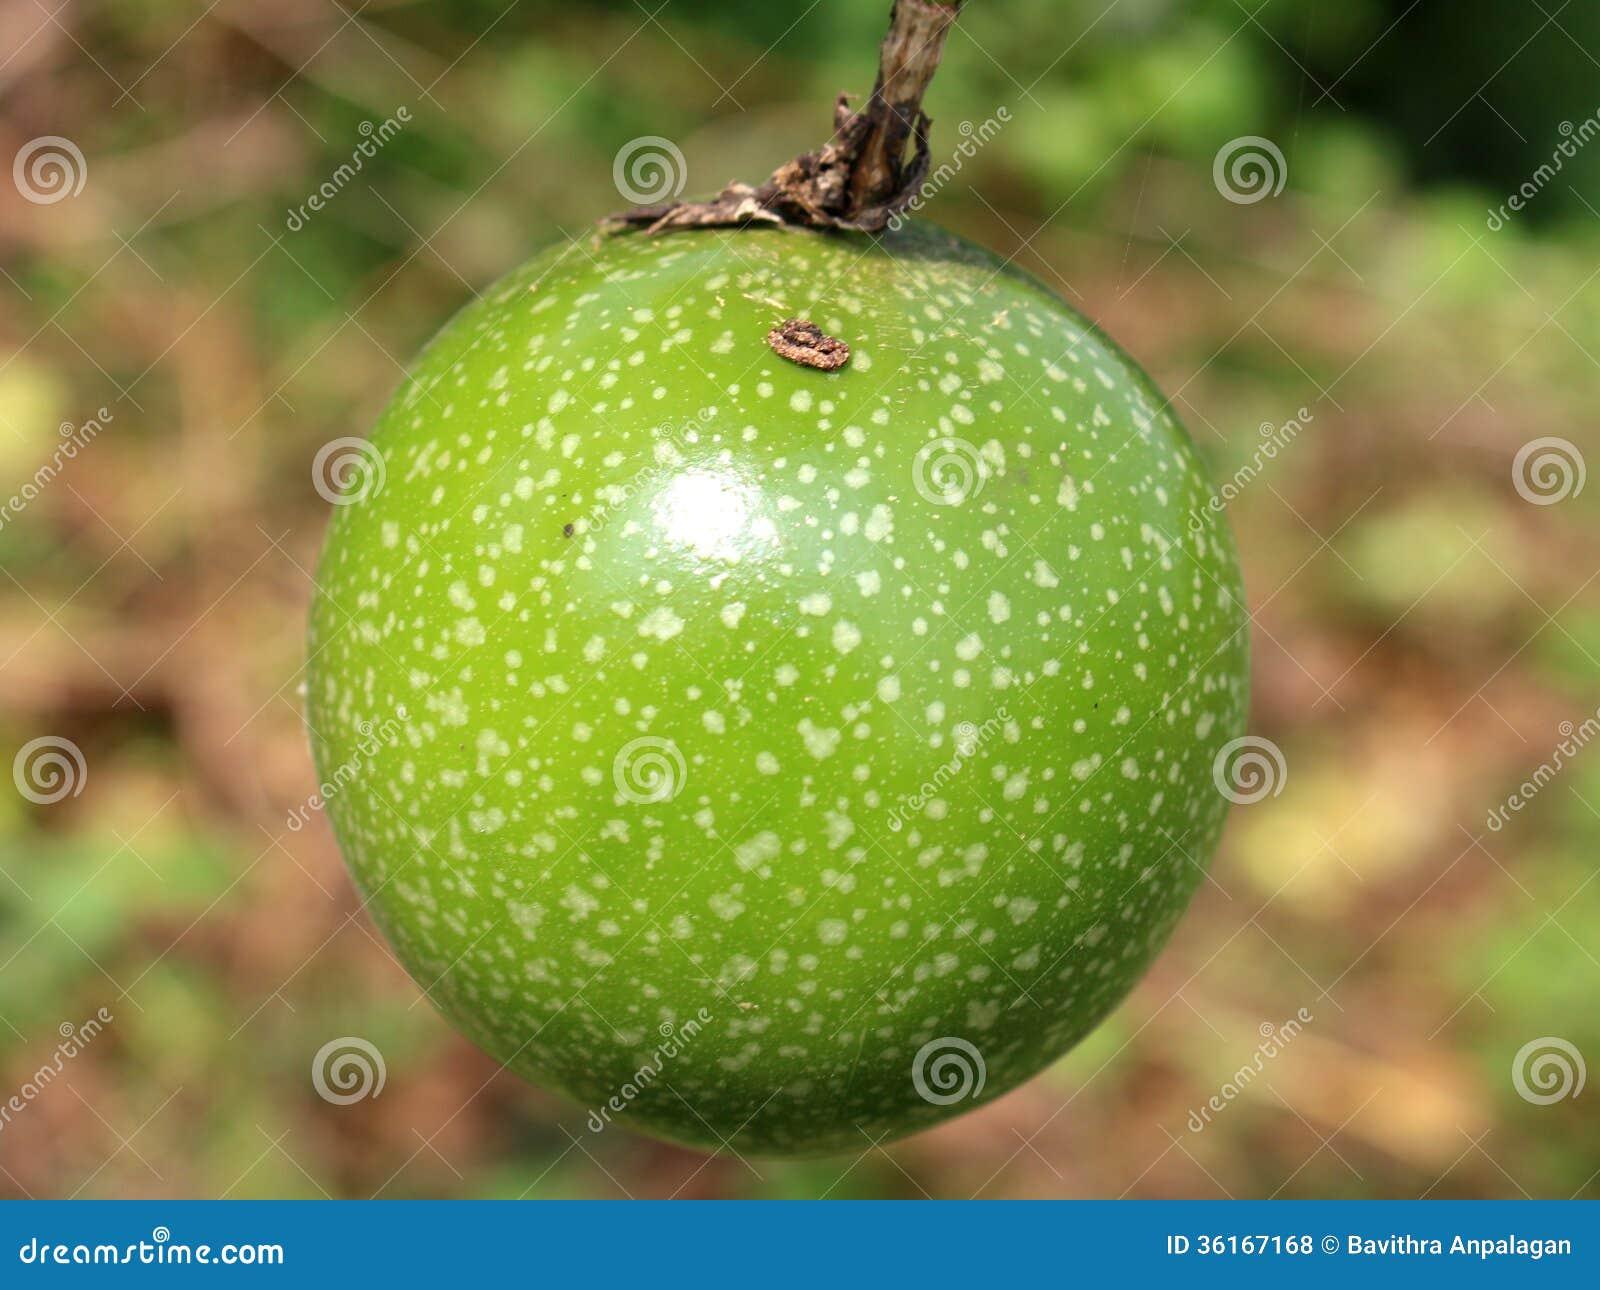 Passion Fruit Royalty Free Stock Photos - Image: 36167168